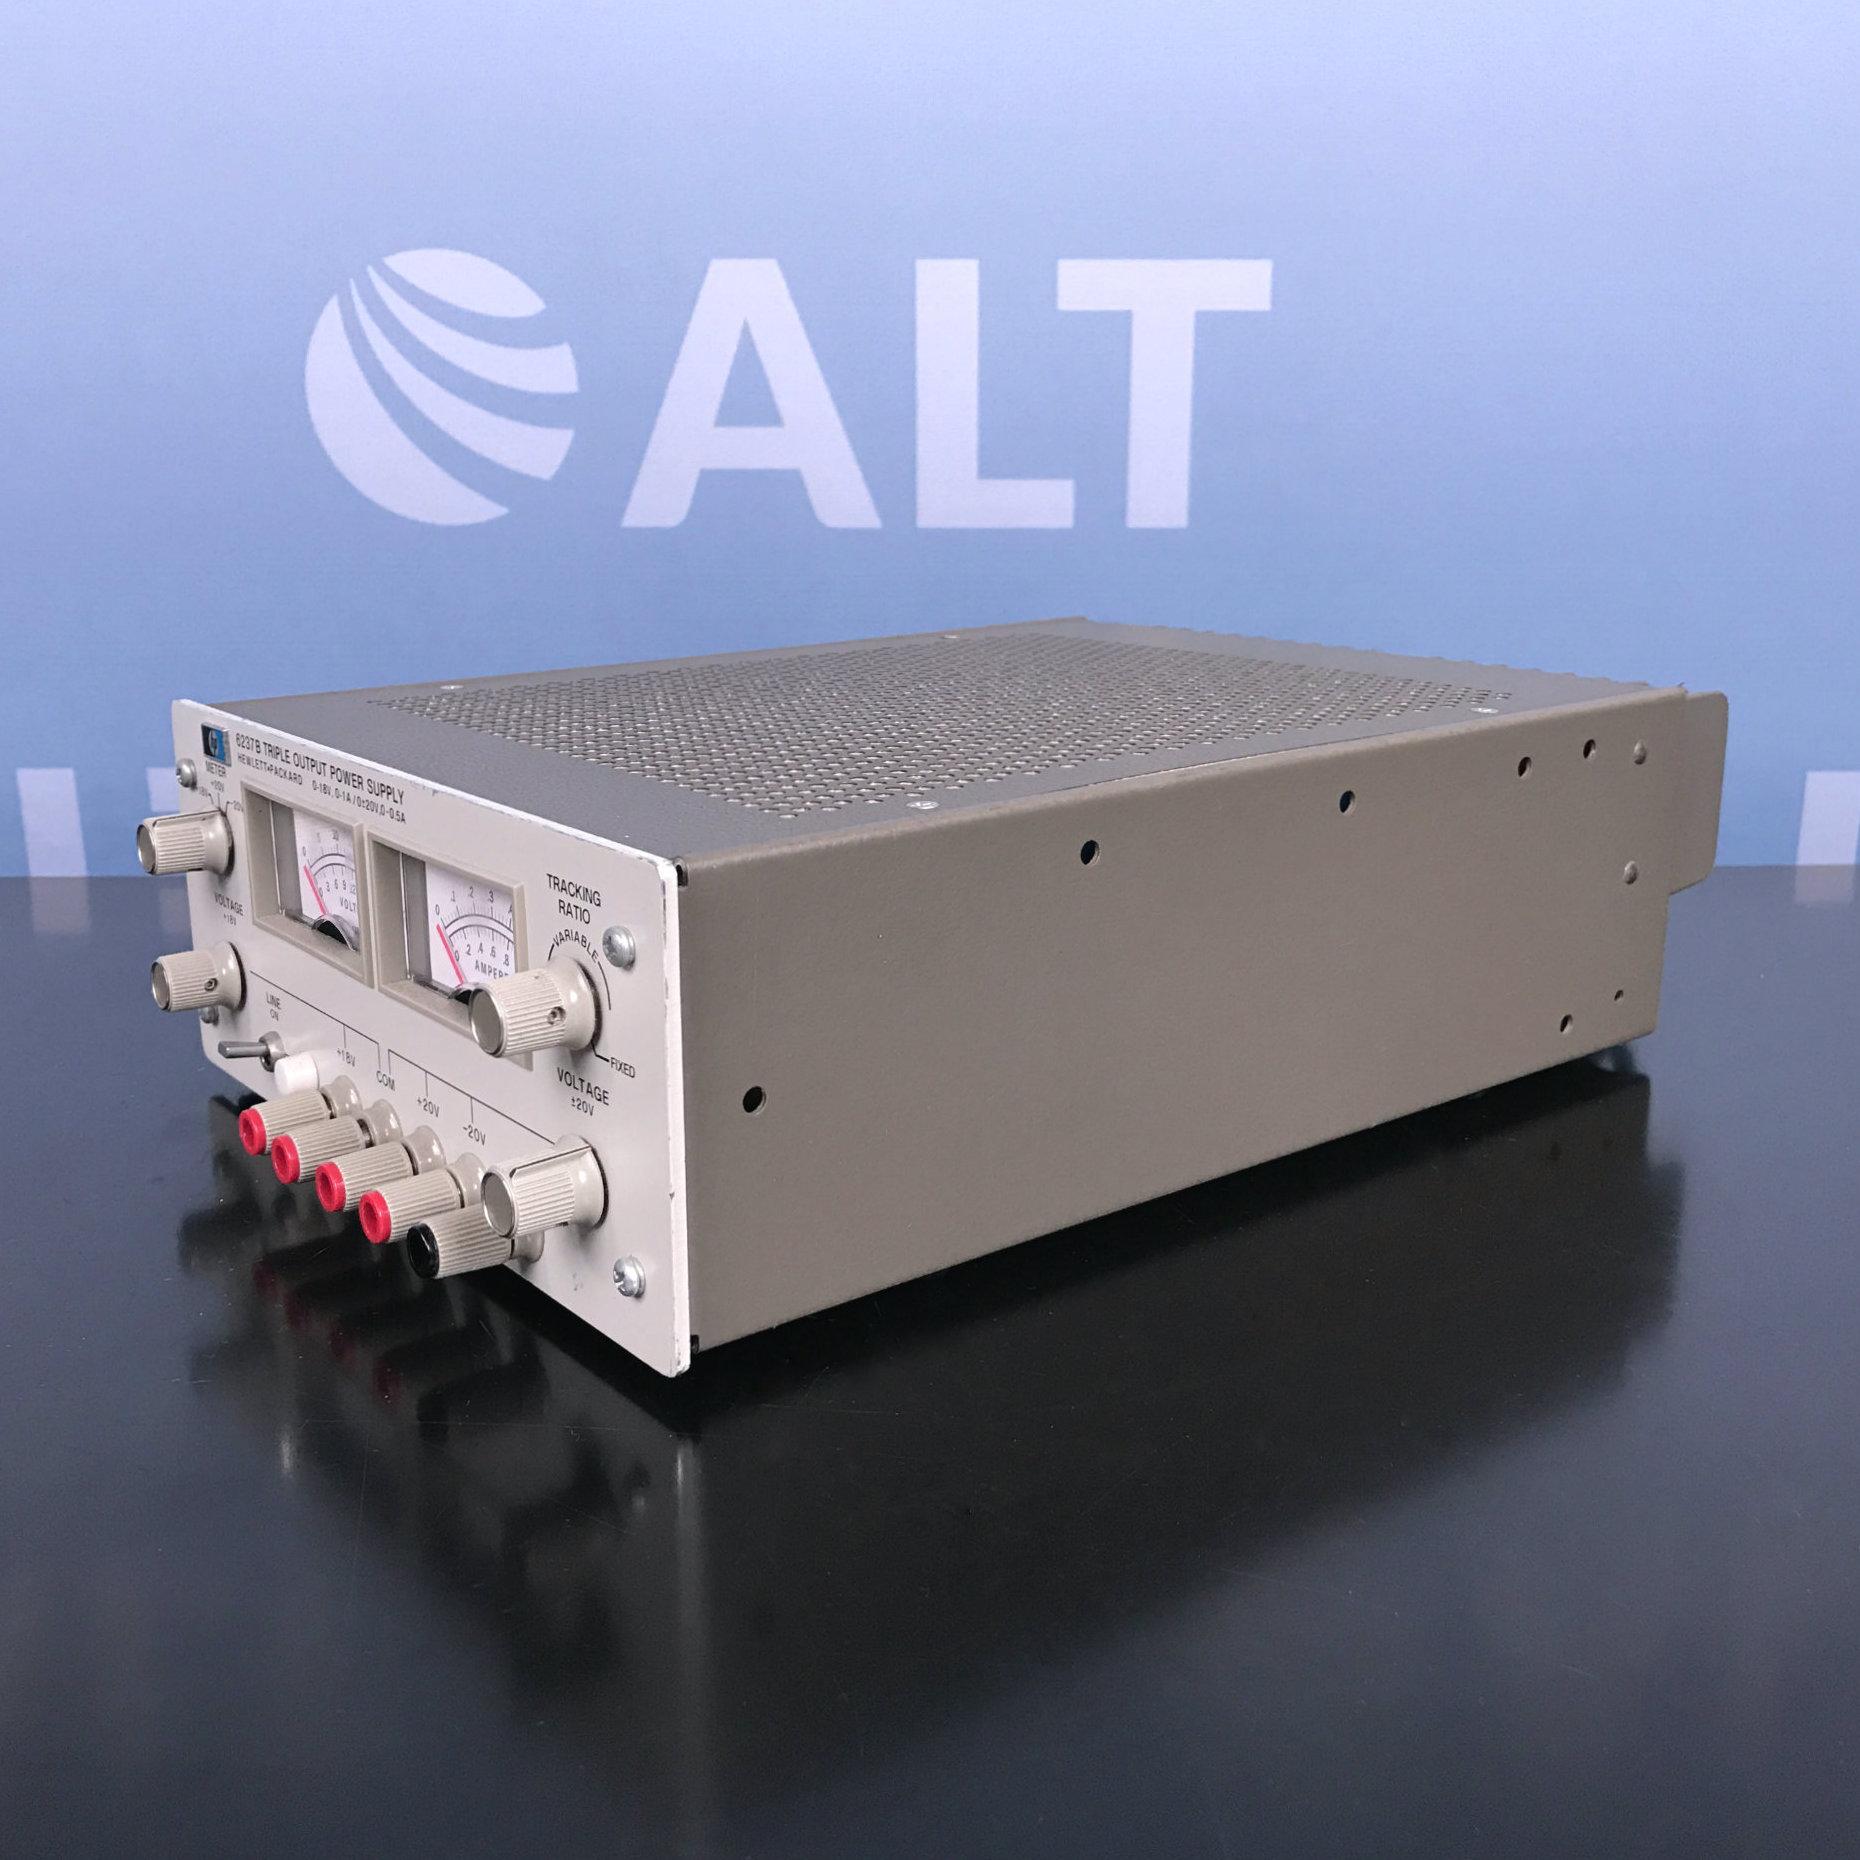 Hewlett Packard 6237B Triple Output Power Supply  Image